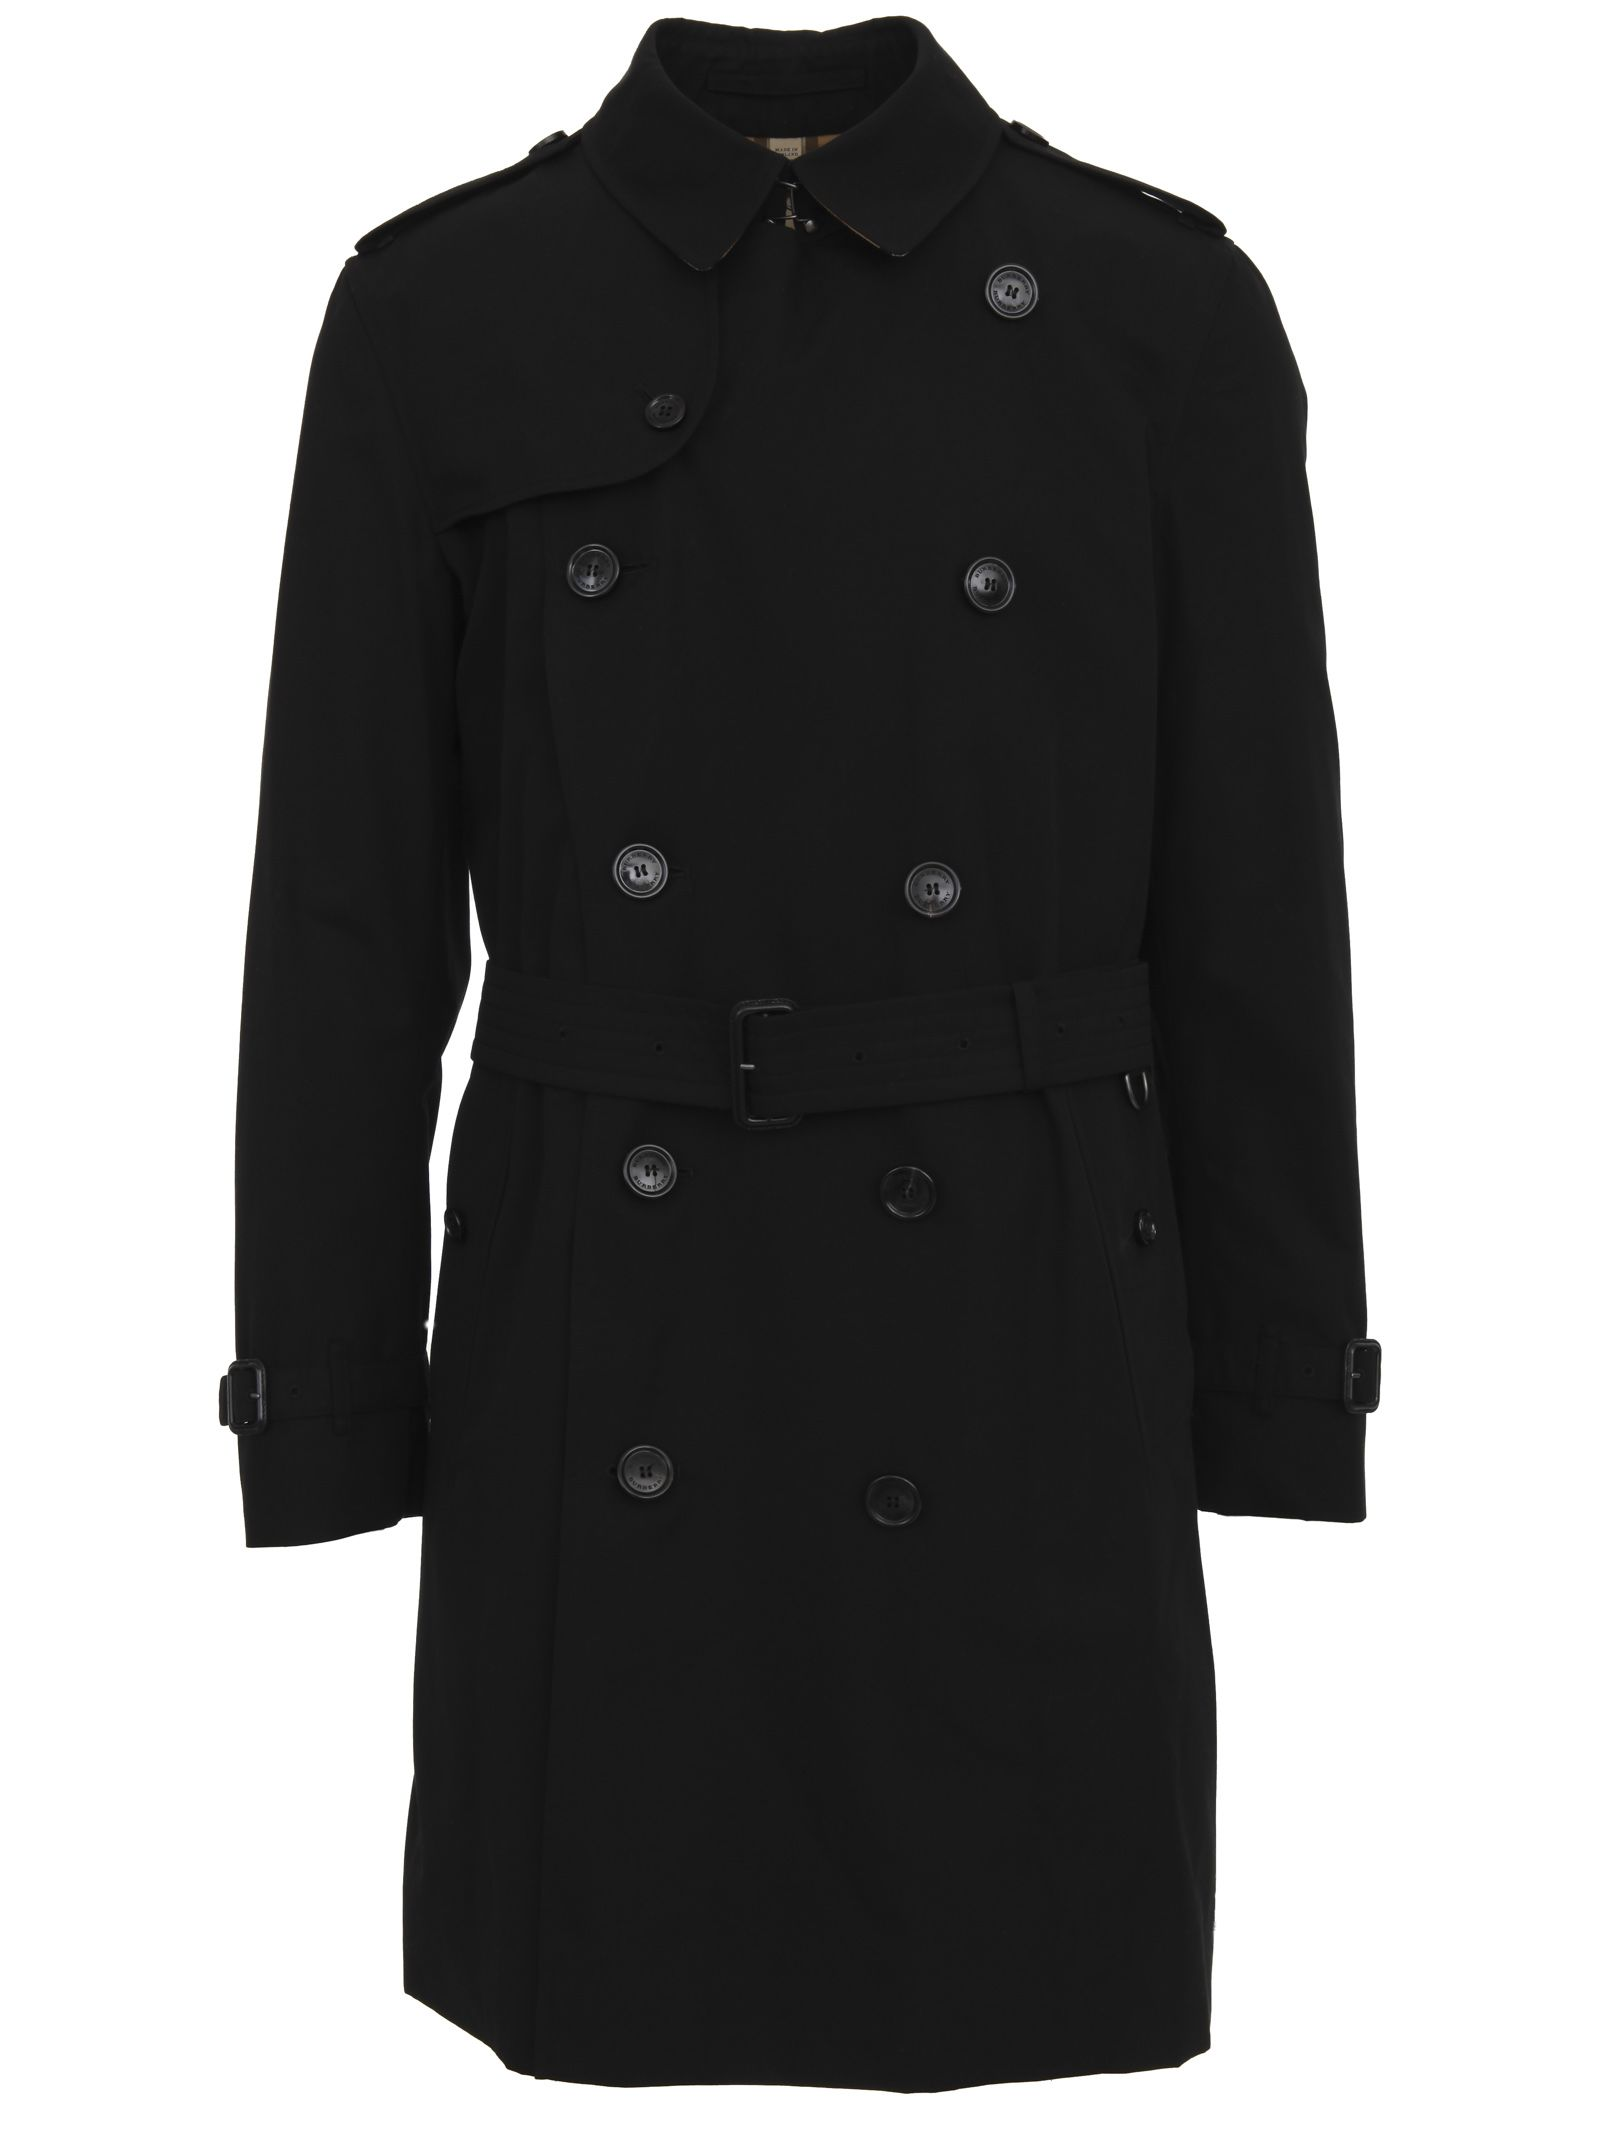 d066a22f54ef Burberry Burberry Trench Coat - Black - 10986464 | italist